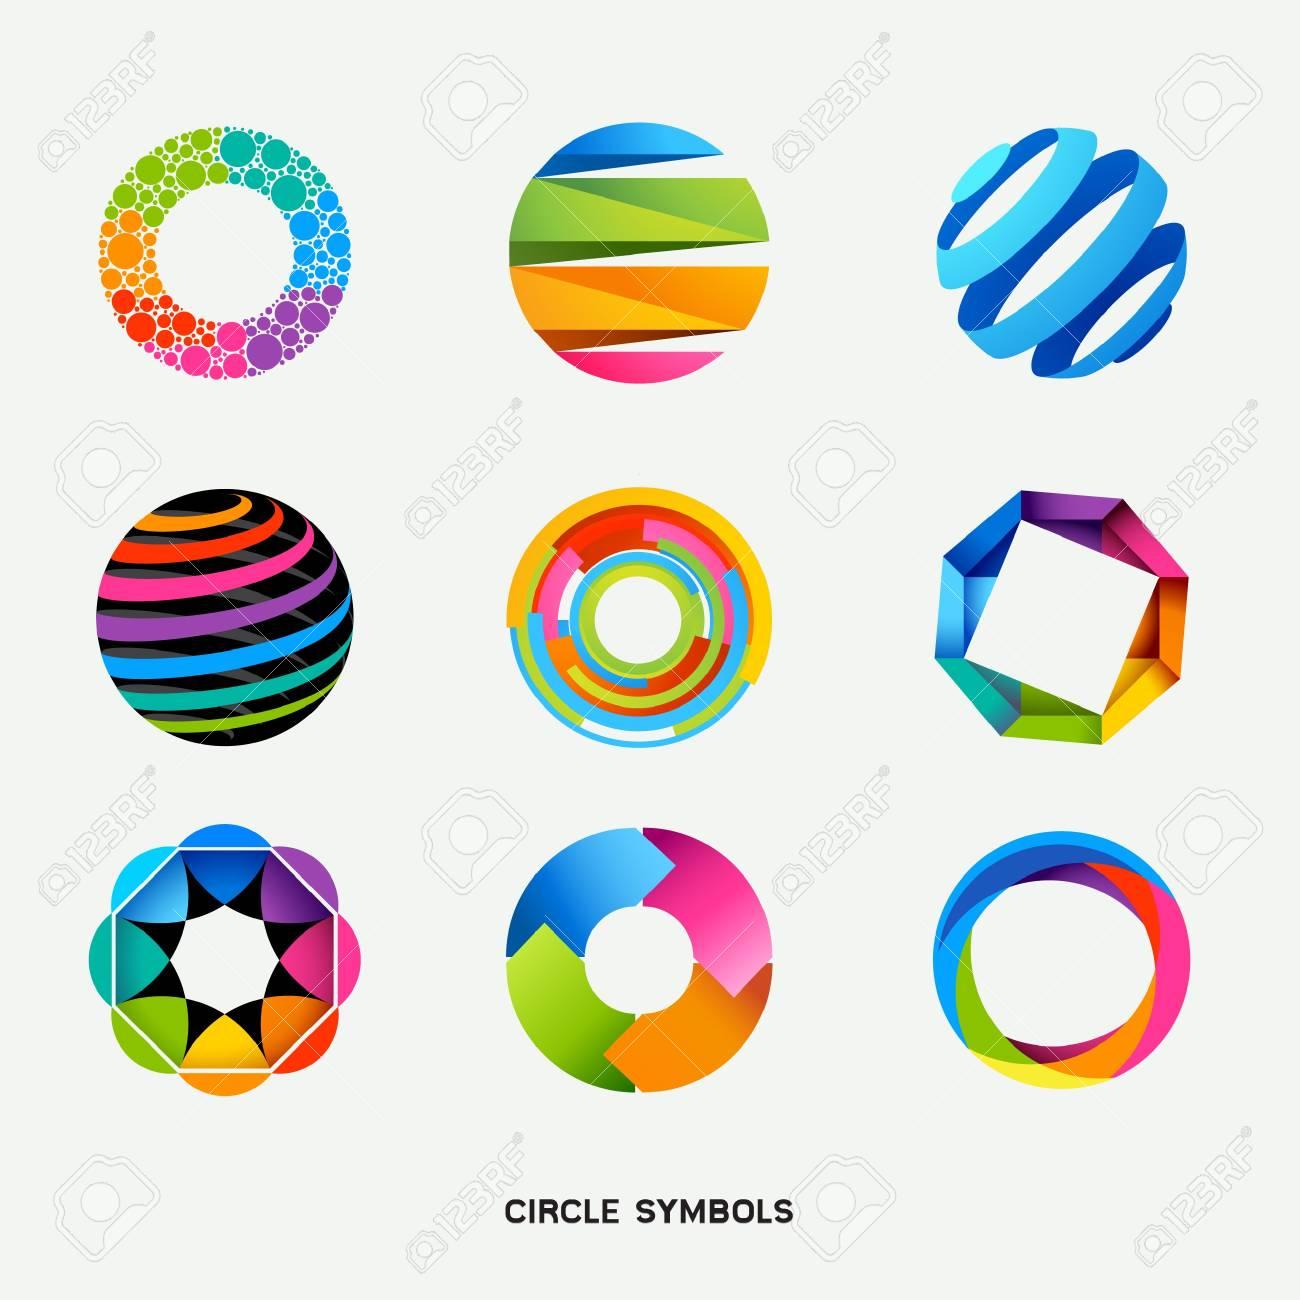 Circle Design Symbols Collection illustration Stock Vector - 13176015